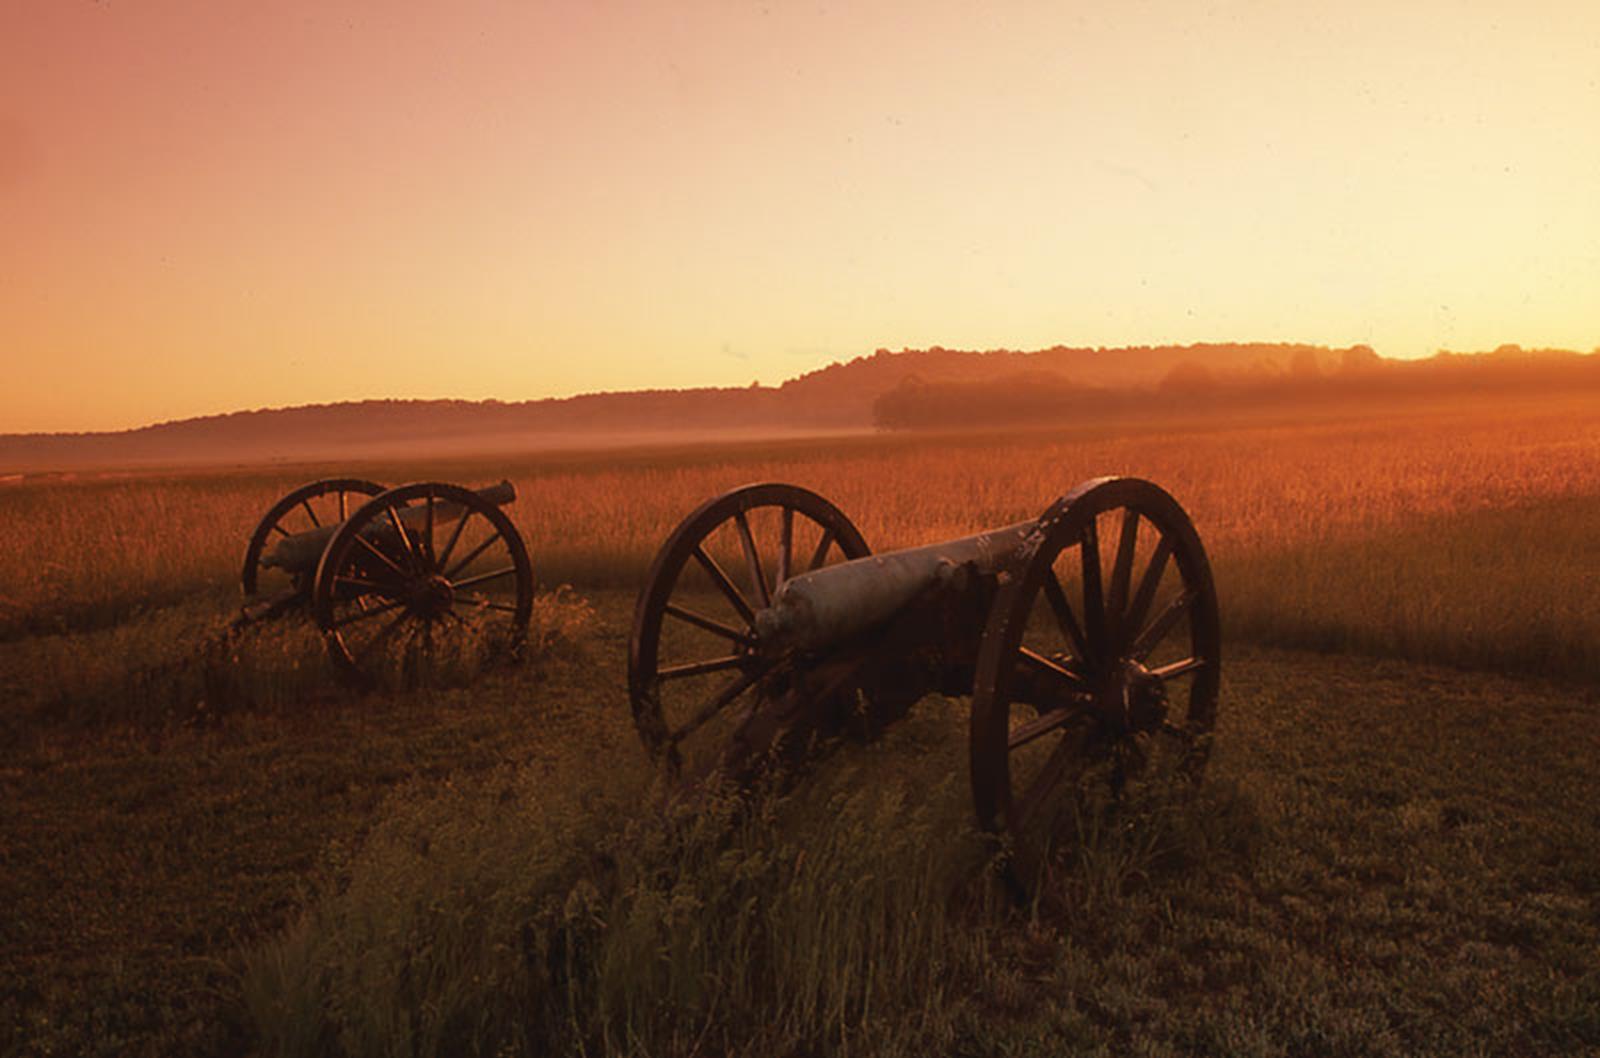 Pea Ridge Battlefield